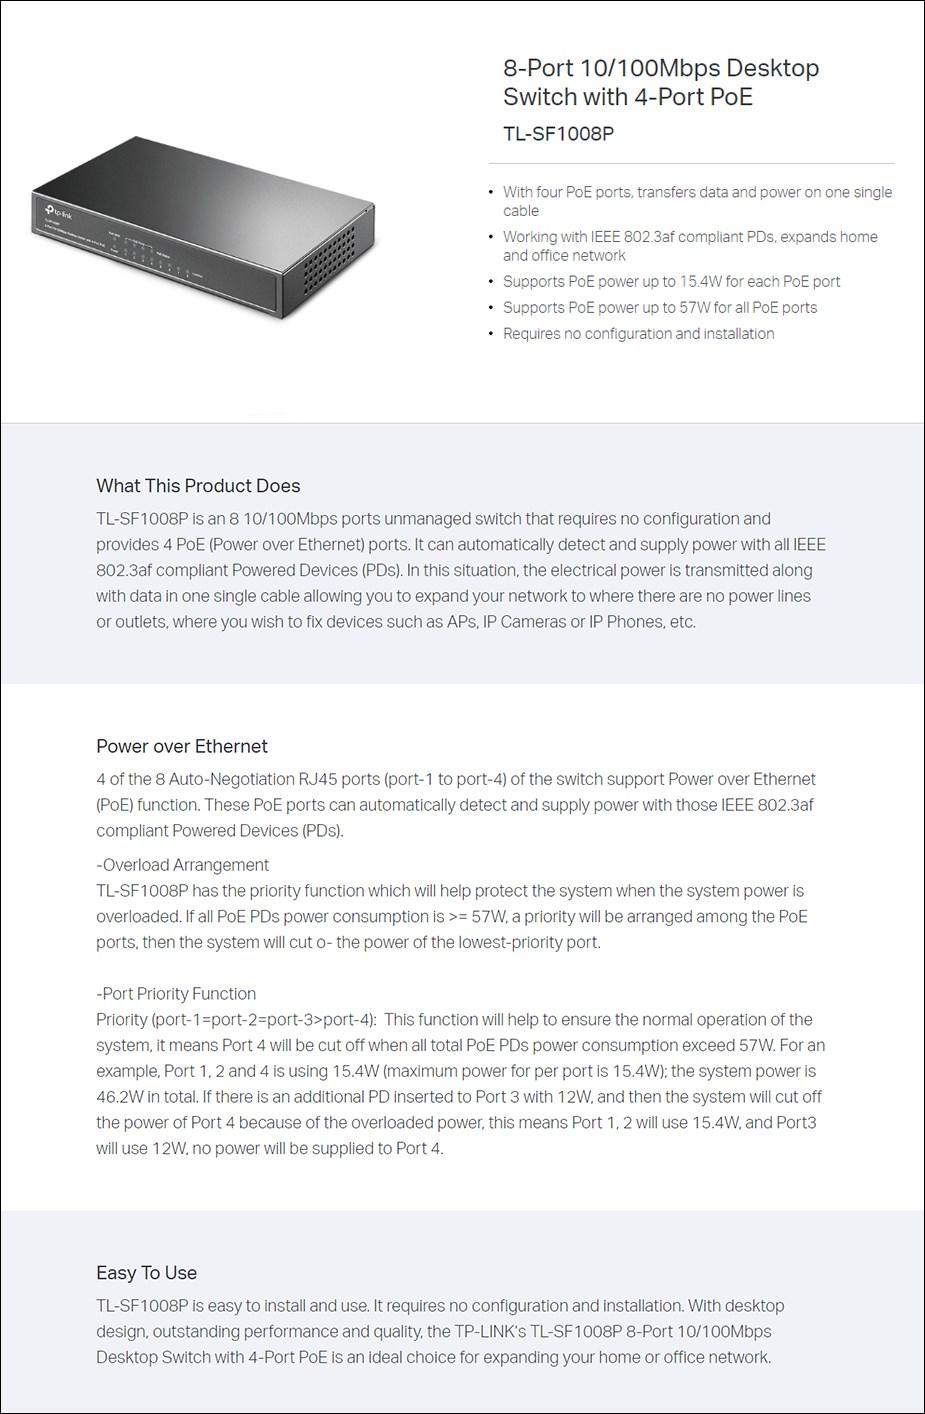 TP-Link TL-SF1008P 8 Port 10/100Mbps Desktop Switch With 4-Port POE - Overview 1